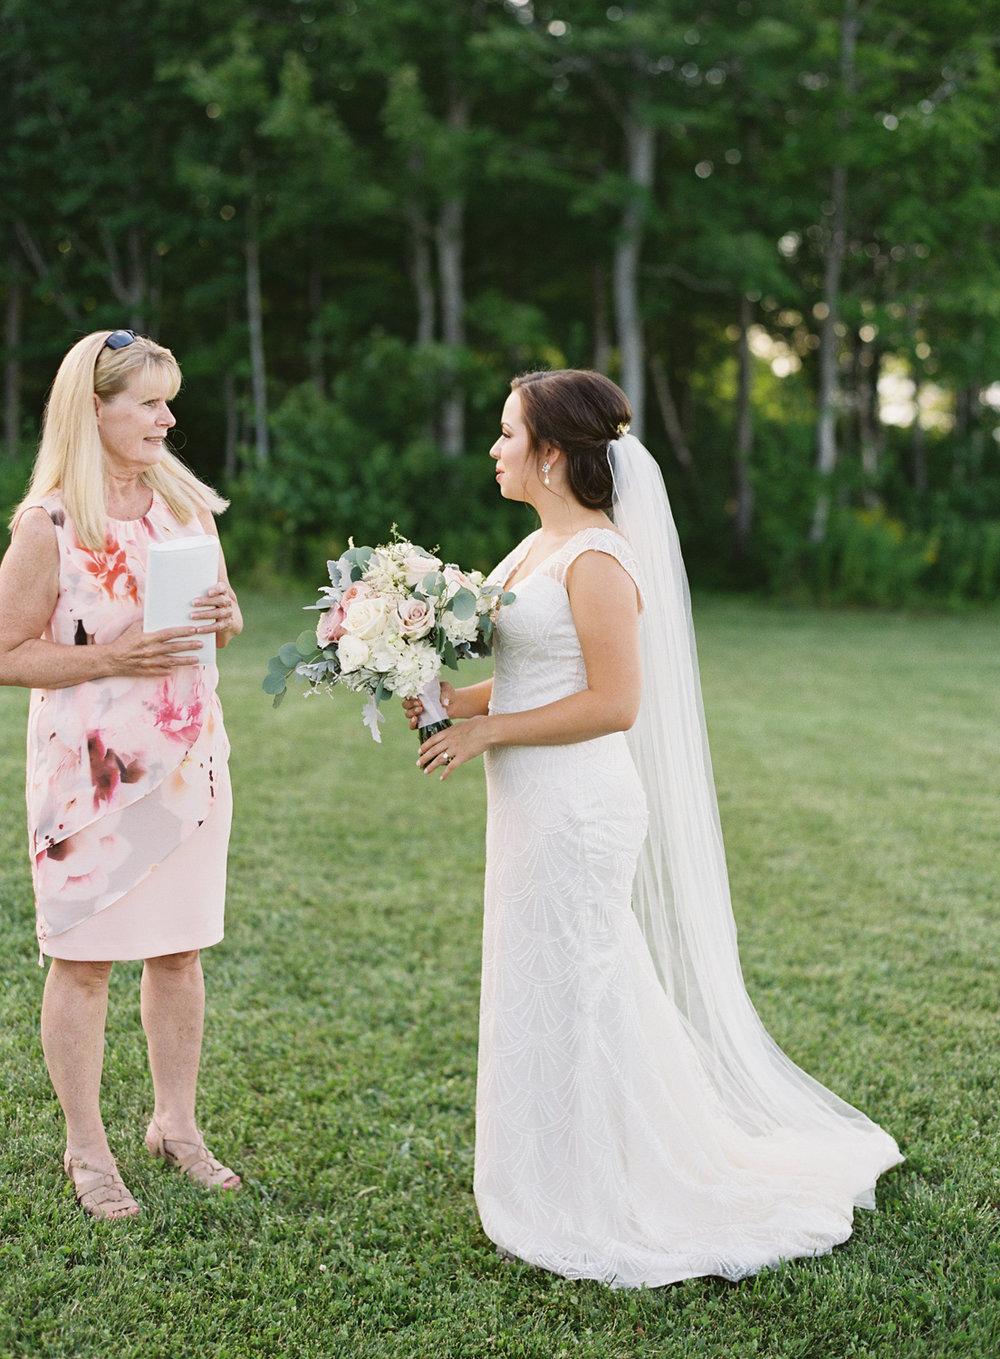 Jacqueline Anne Photography - Nova Scotia Backyard Wedding-67.jpg